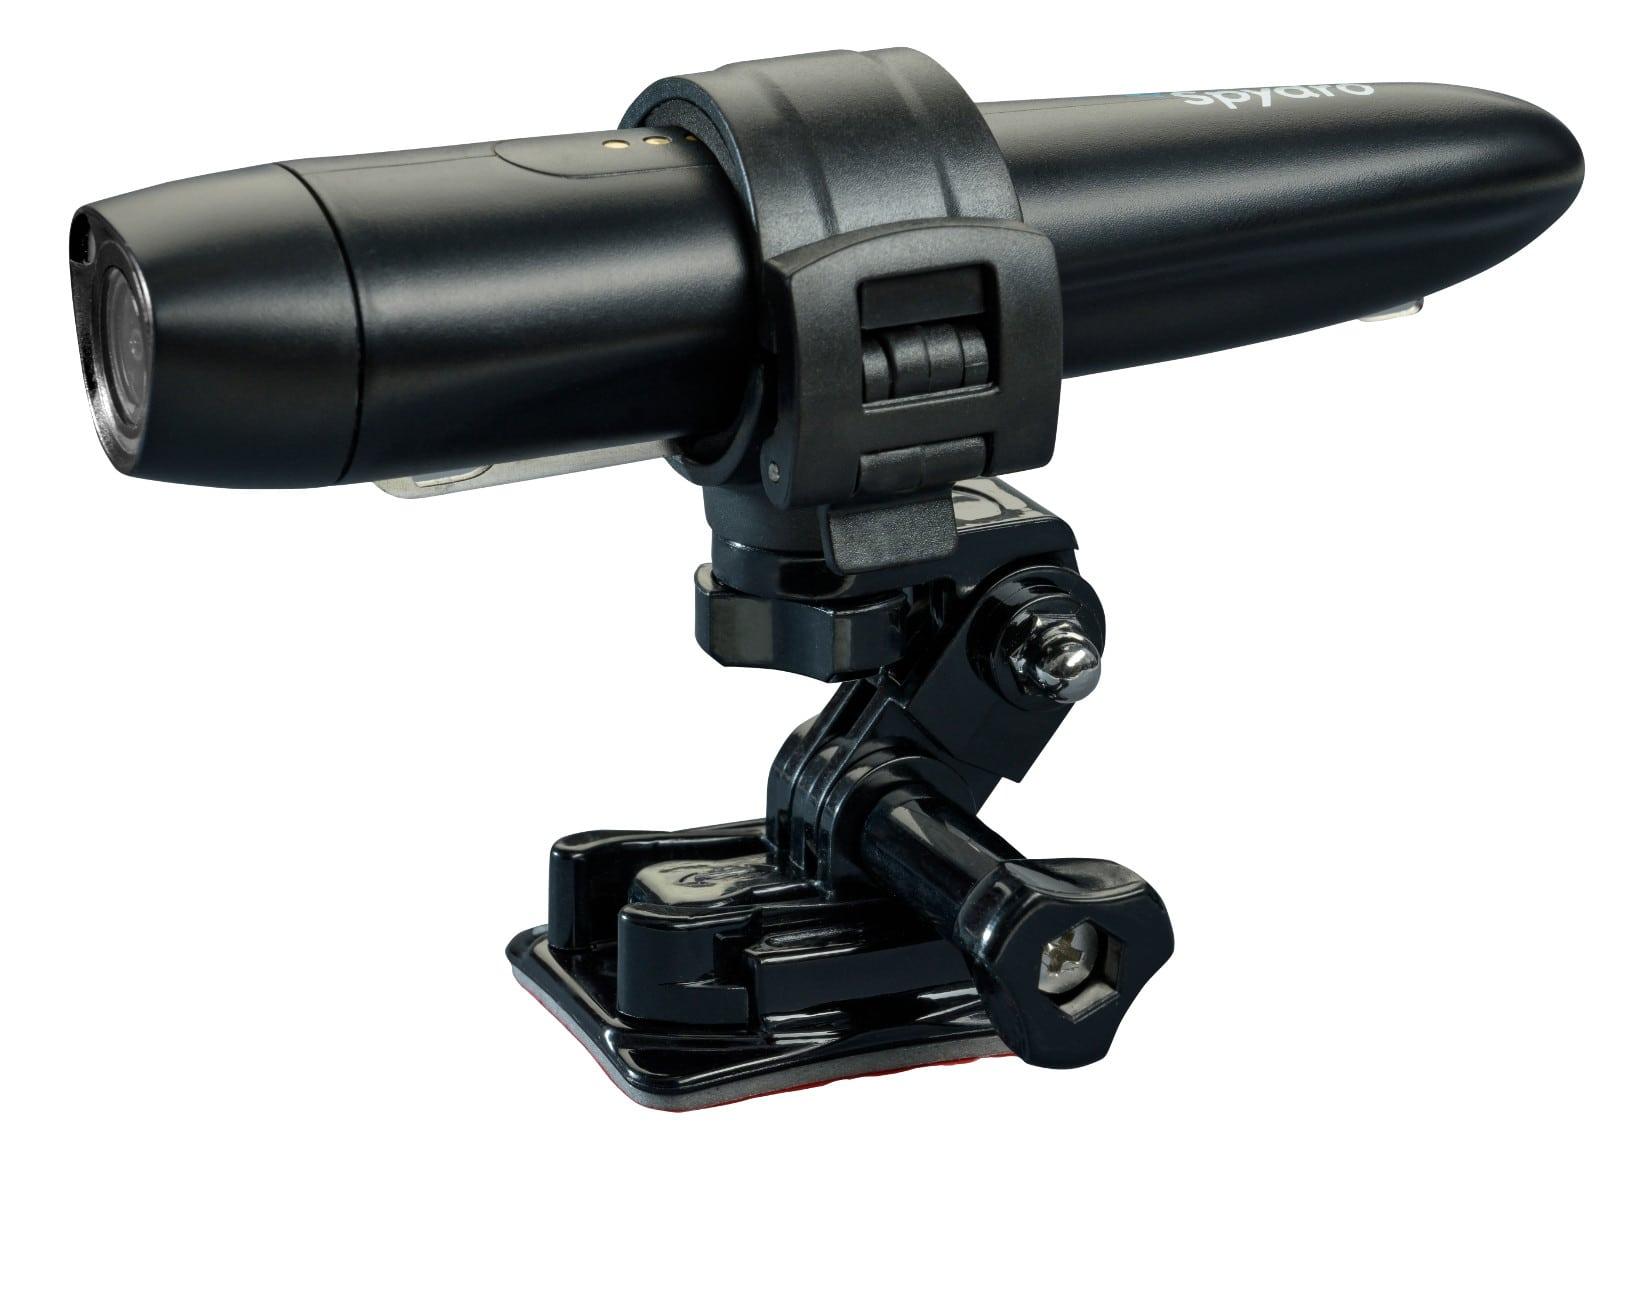 Spydro Fishing Camera Boat Mount